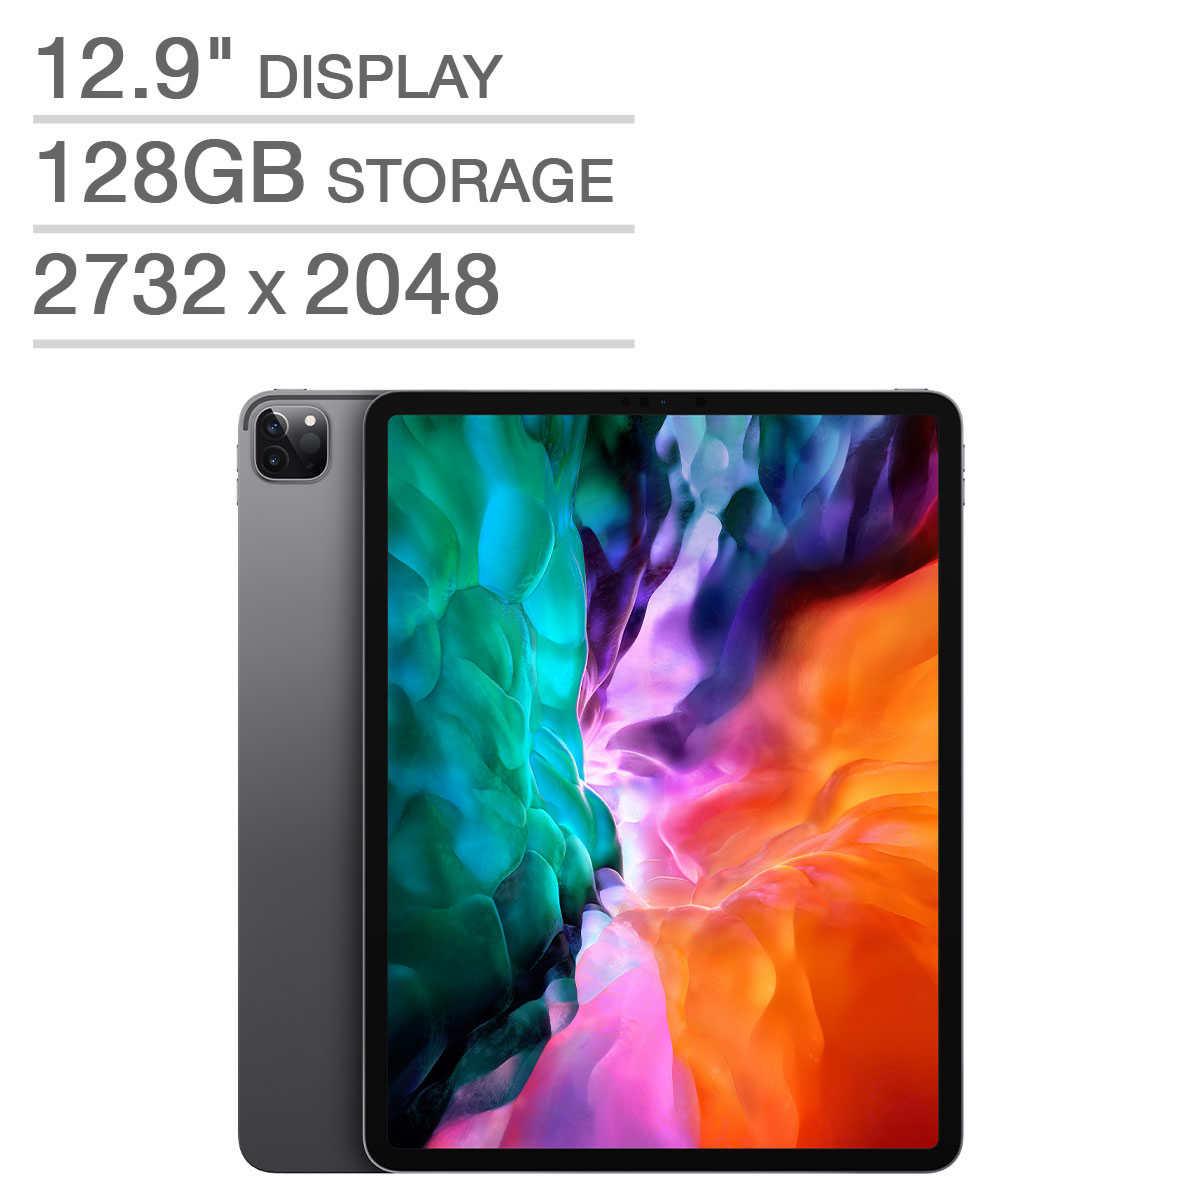 iPad Pro 12.9in 128gb Space Gray 4th Gen $799.99